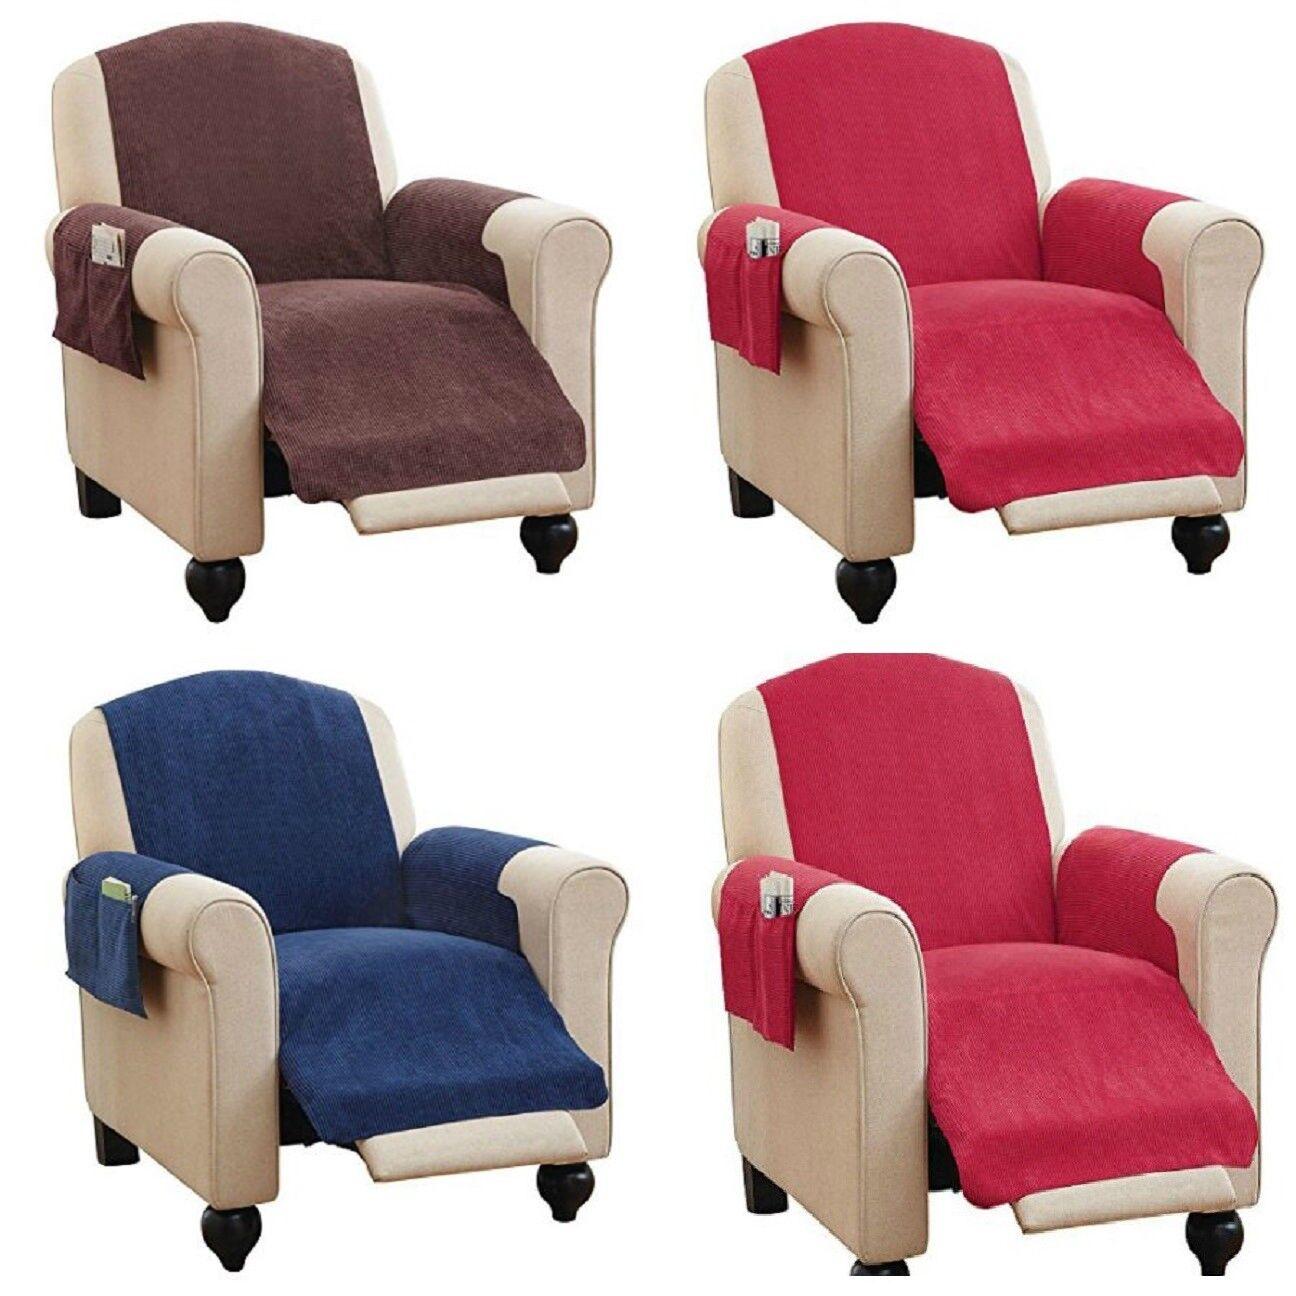 Faux Chenille Recliner Chair Cover & Pockets READ DESCRIPTION Read Description!! Furniture